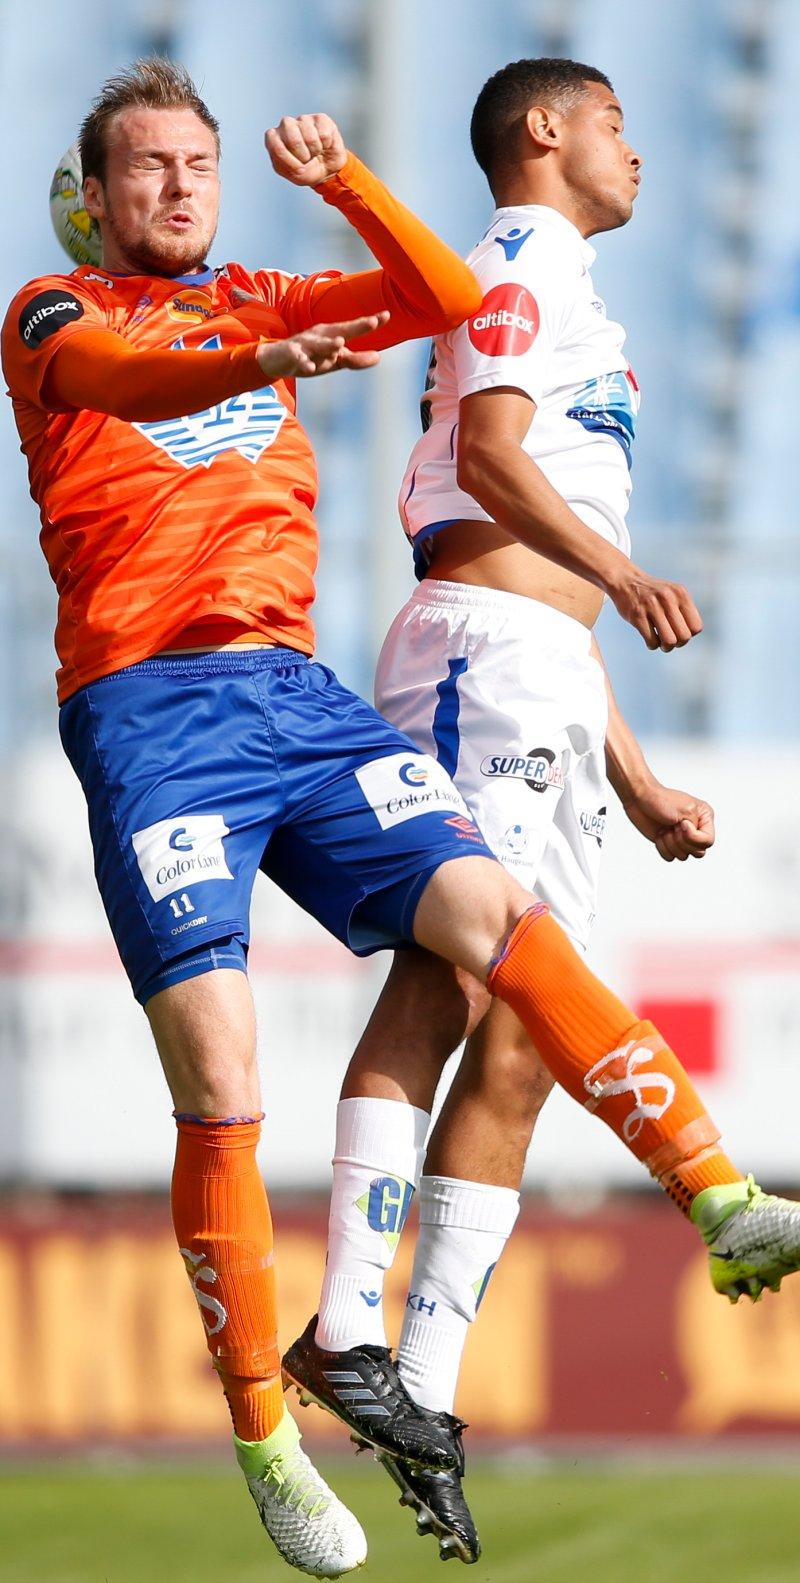 Thrandarson i duell med Bruno Leite. Foto: Jan Kåre Ness / NTB Scanpix